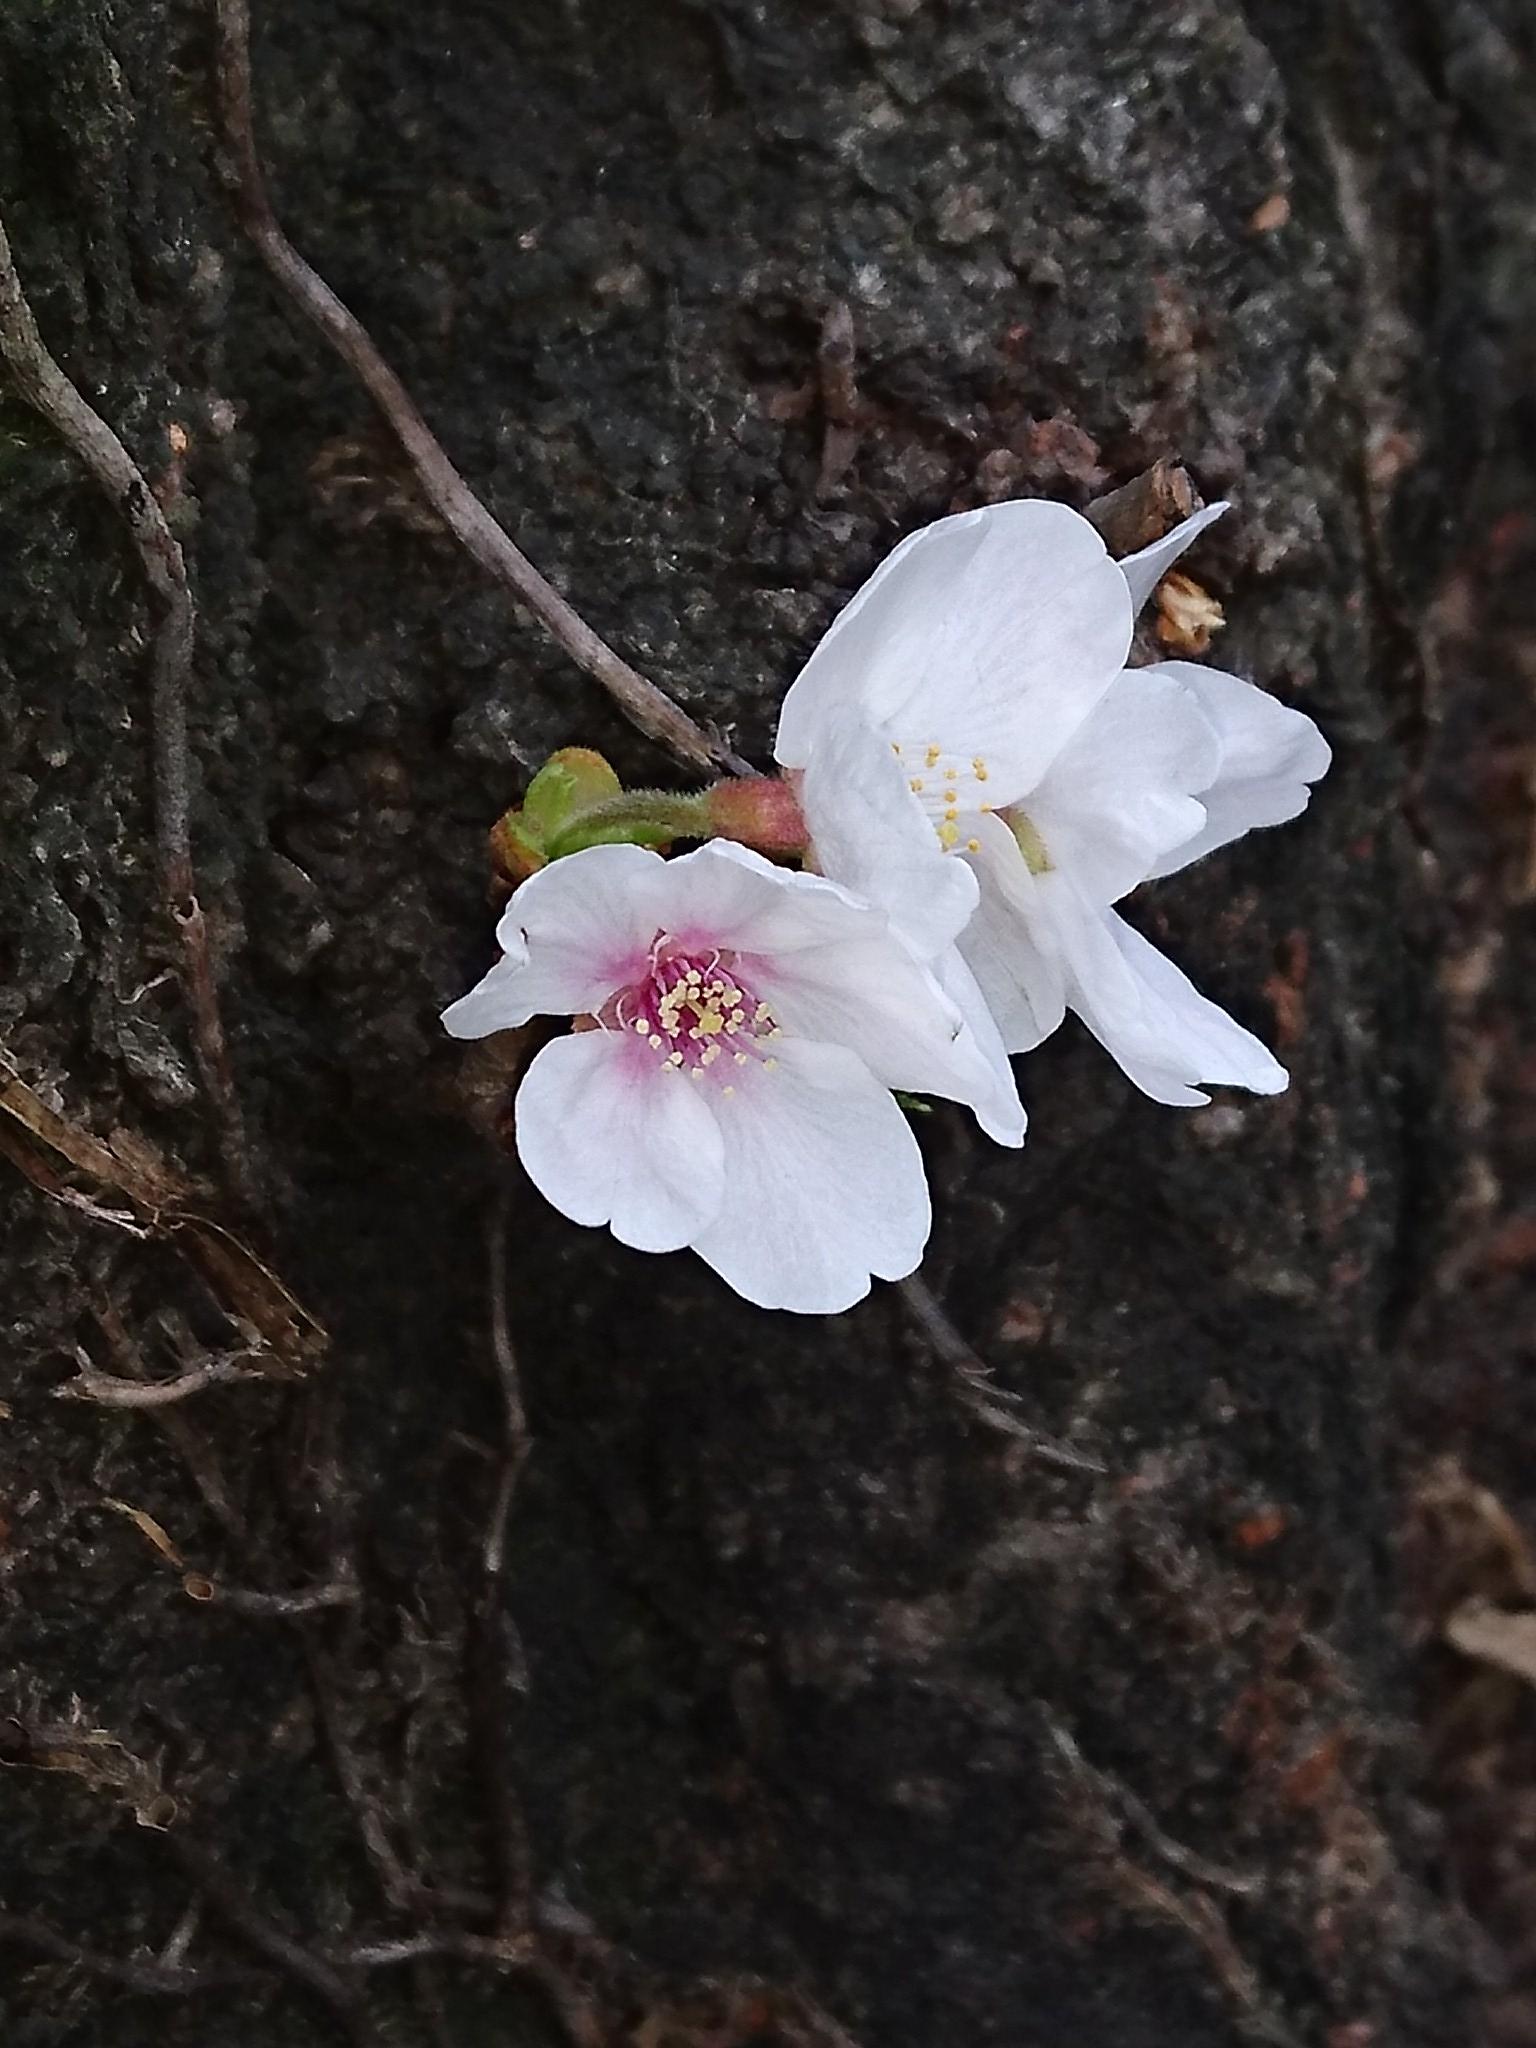 16-03-27-09-07-55-153_photo.jpg